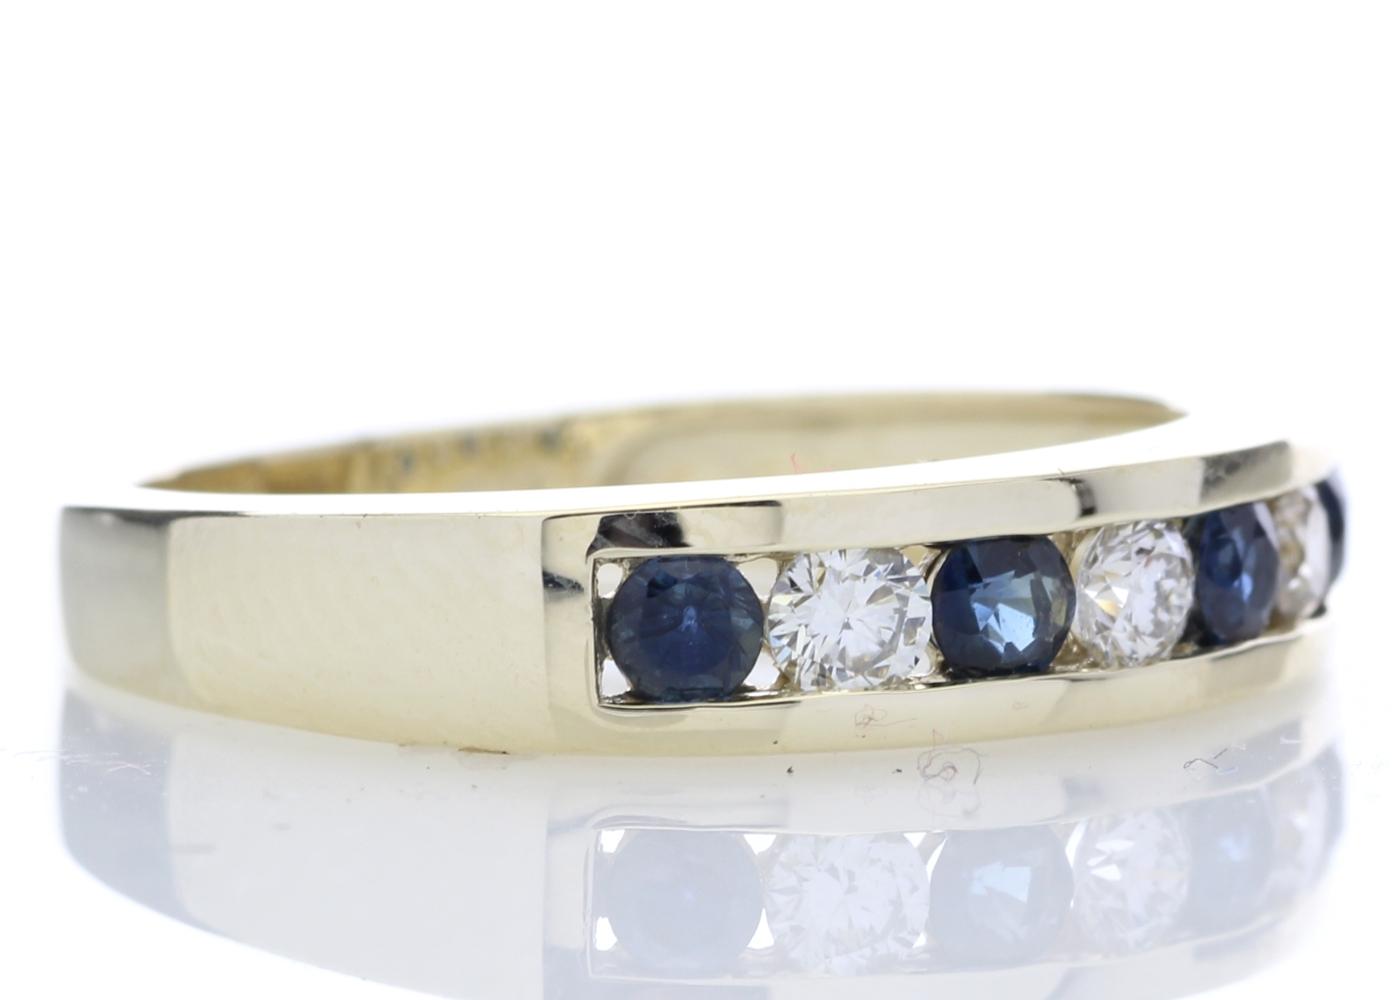 9ct Yellow Gold Channel Set Semi Eternity Diamond Ring 0.25 Carats - Image 4 of 5